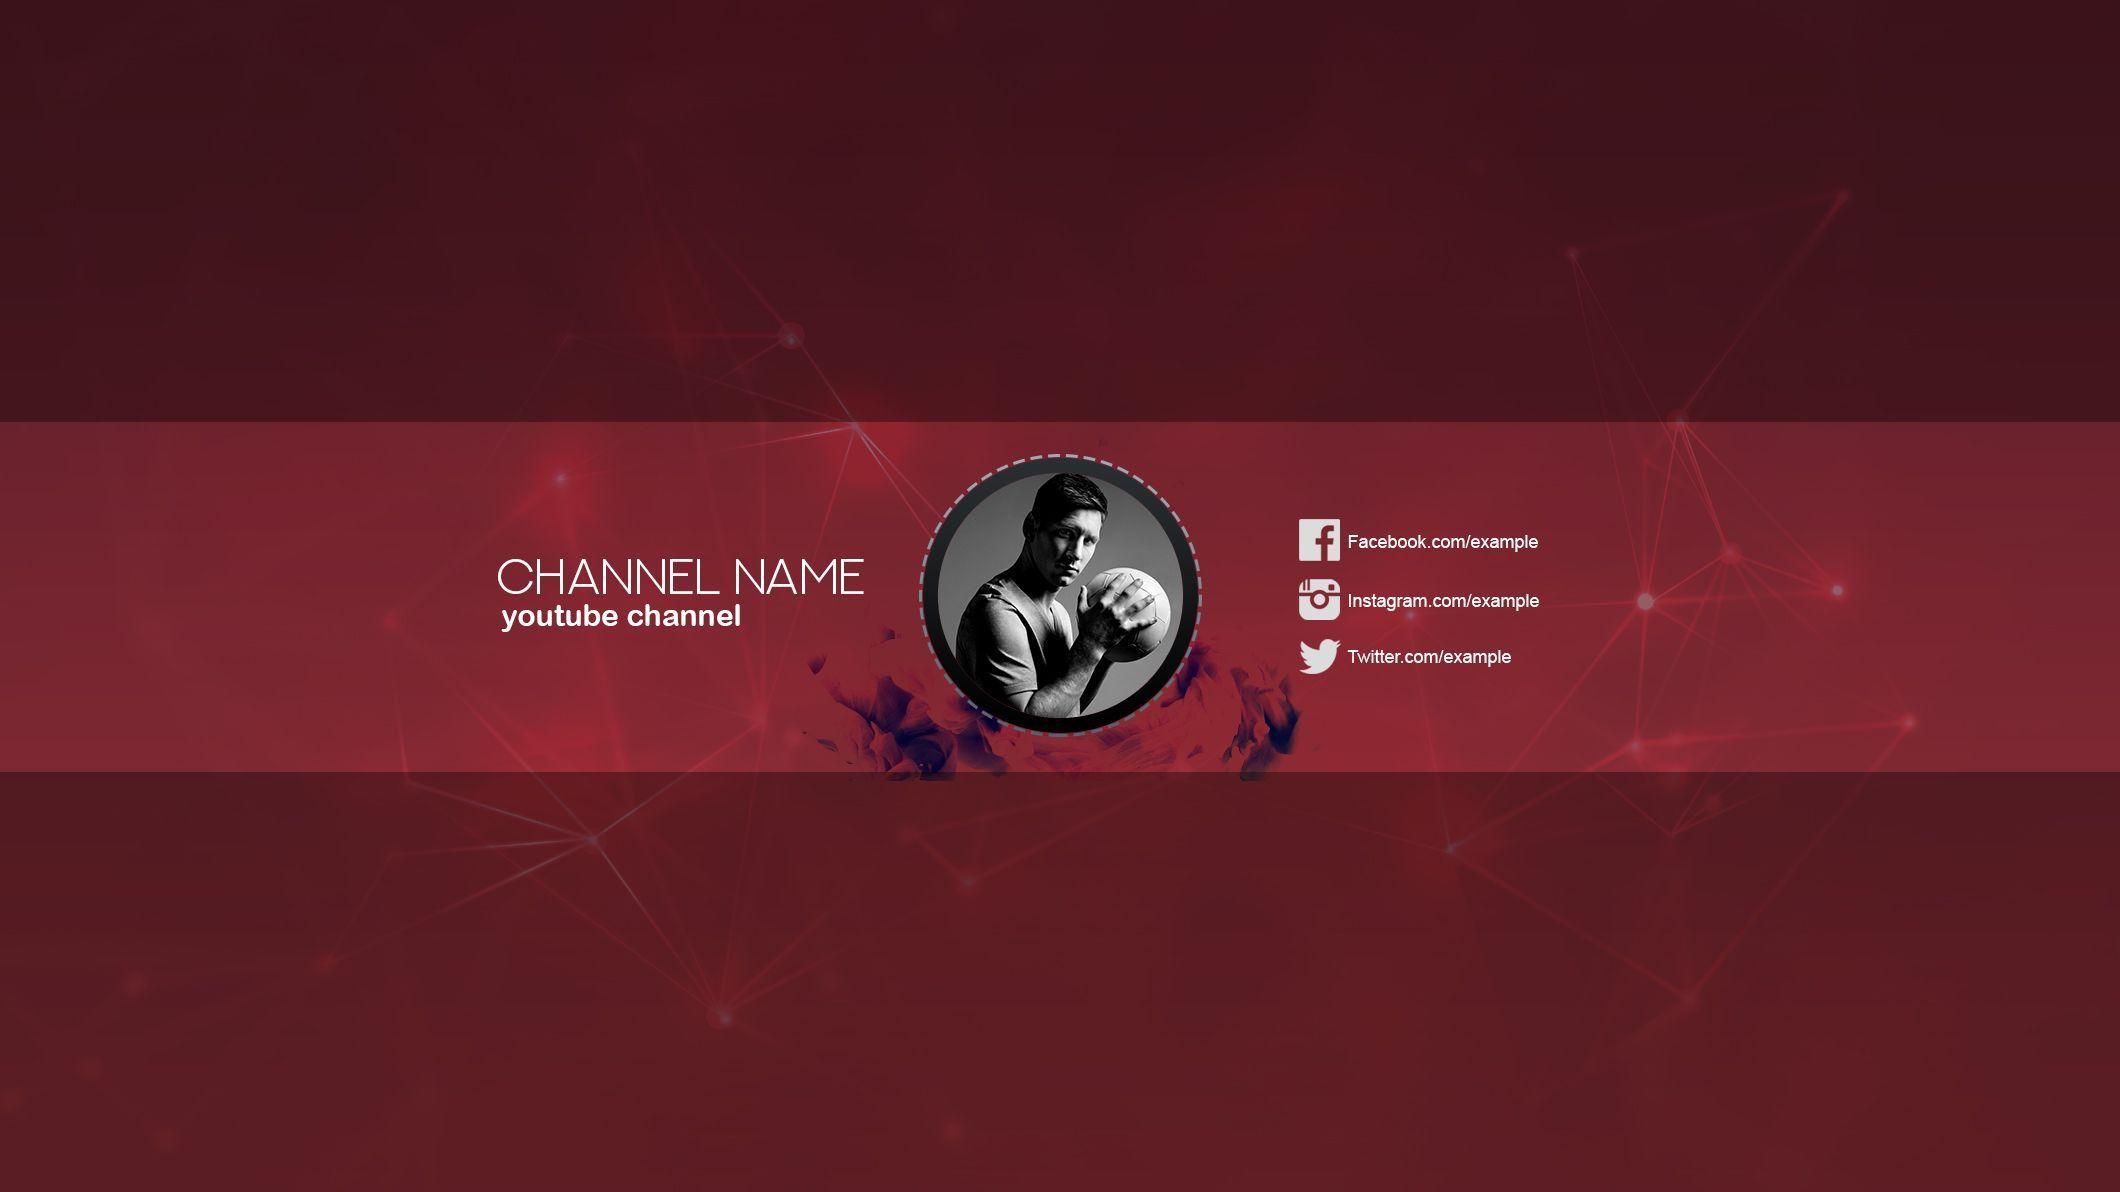 000 Impressive Free Channel Art Template Concept Full